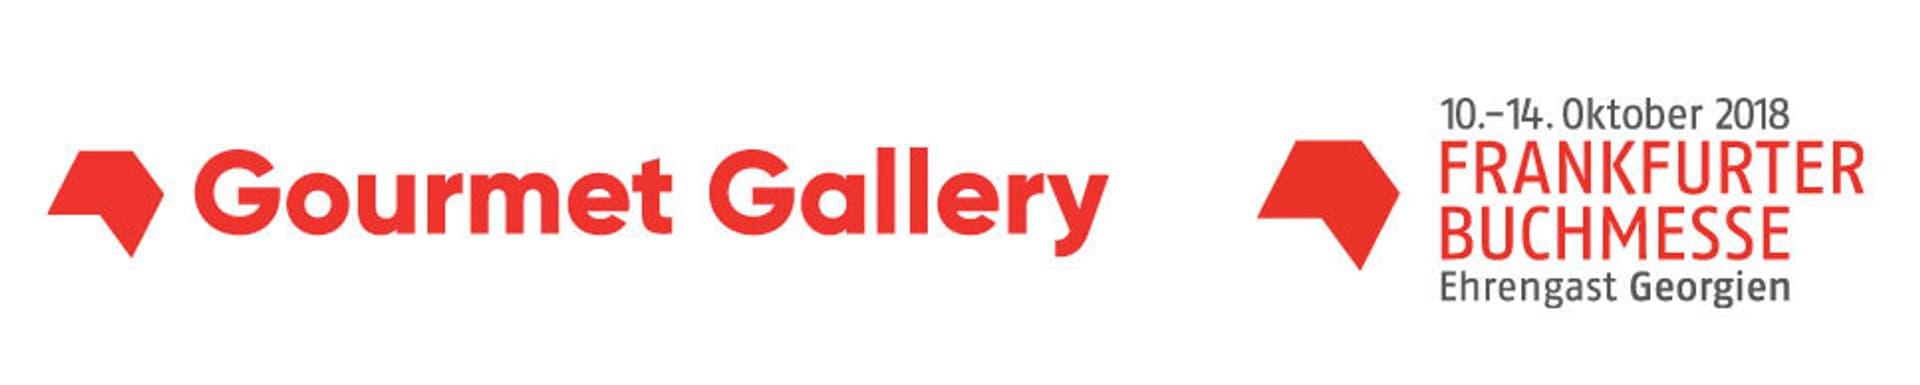 Buchmesse logos